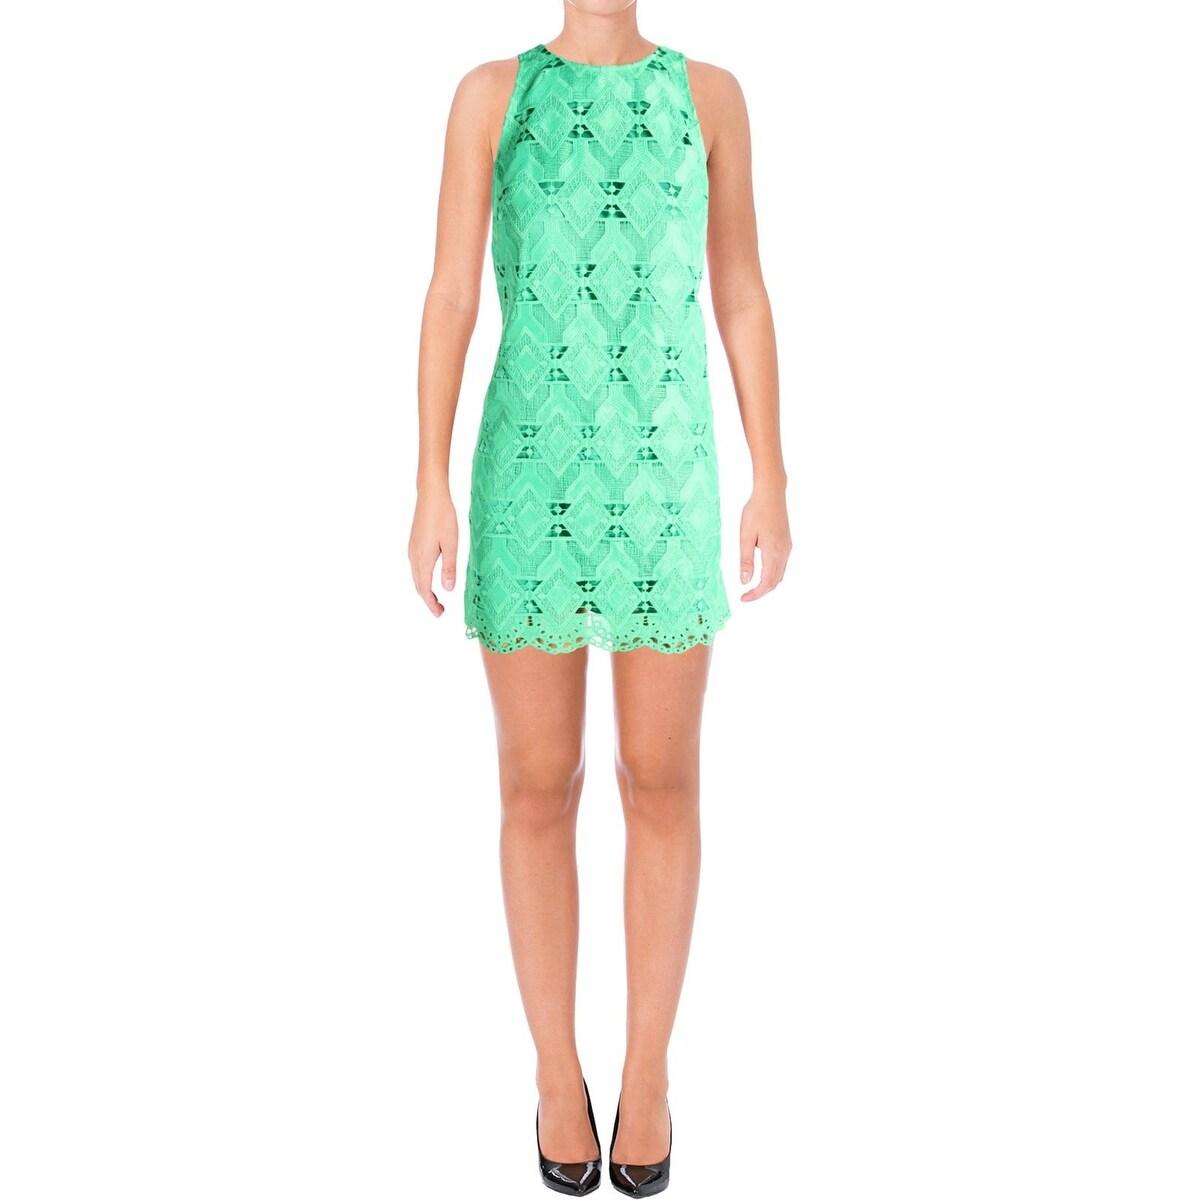 042afa3e152 Petite Special Occasion Dresses Sale